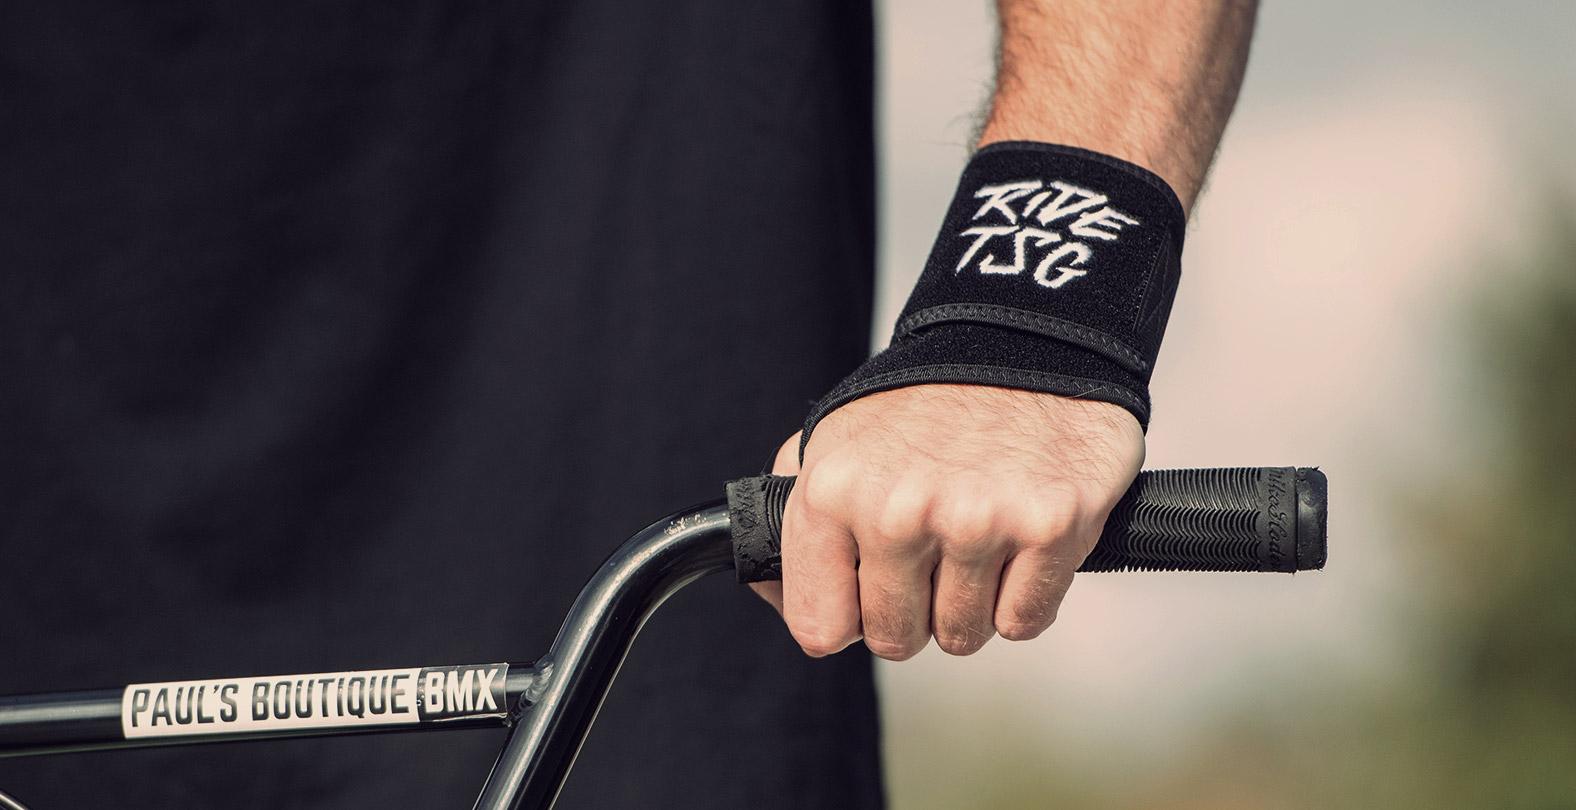 TSG wrist brace bike protection